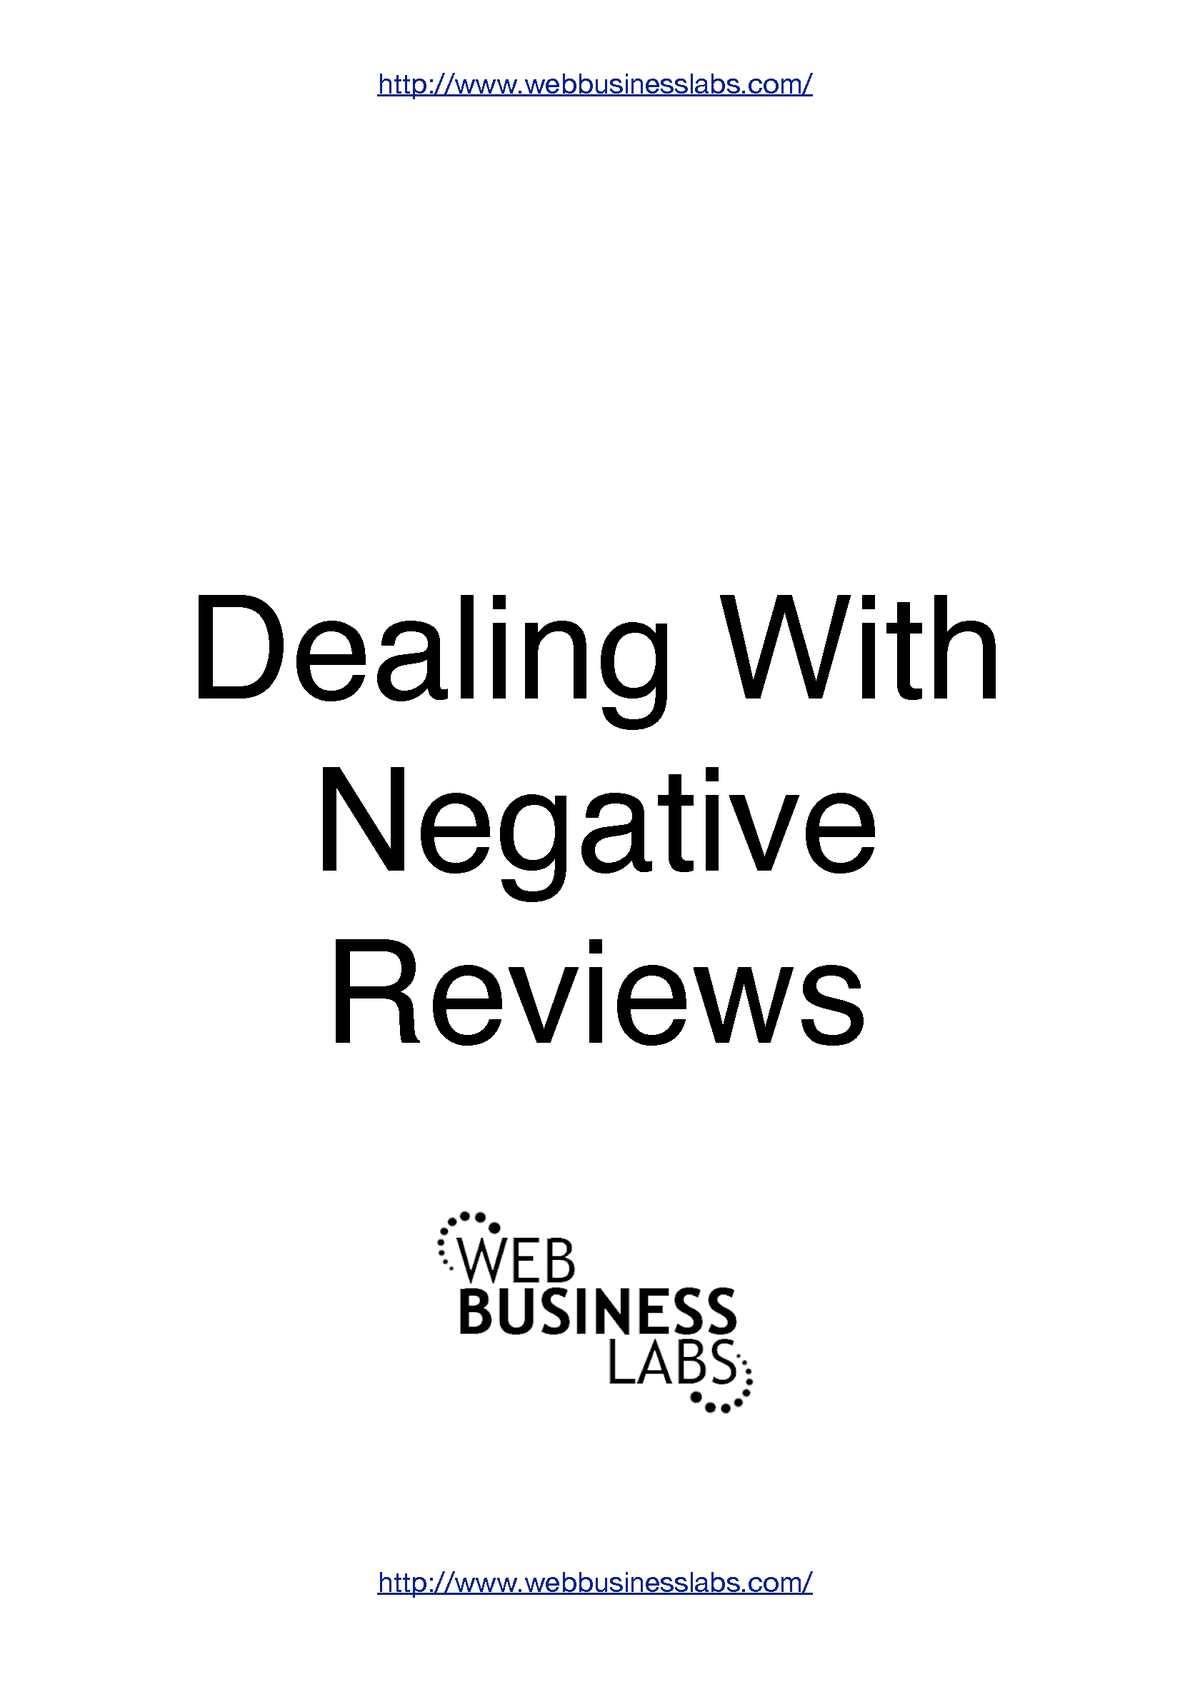 Calaméo - Dealing With Negative Reviews Online